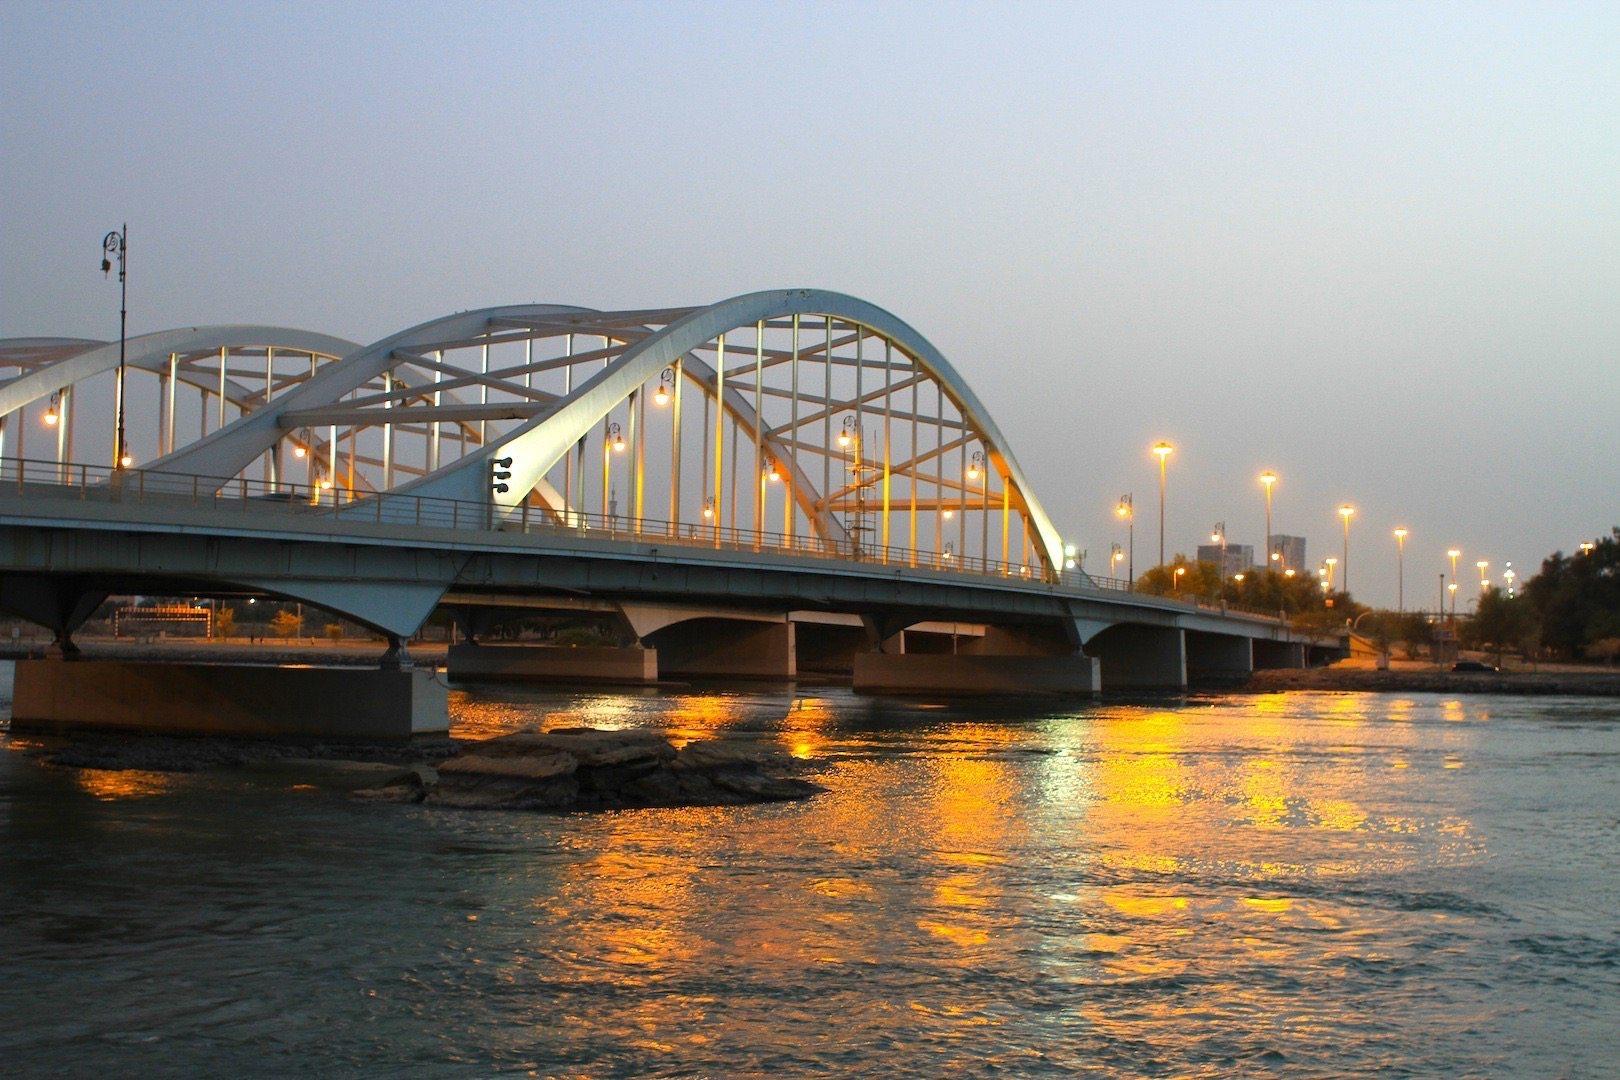 Markant. Die Stahlbogenbrücke Al Maqta